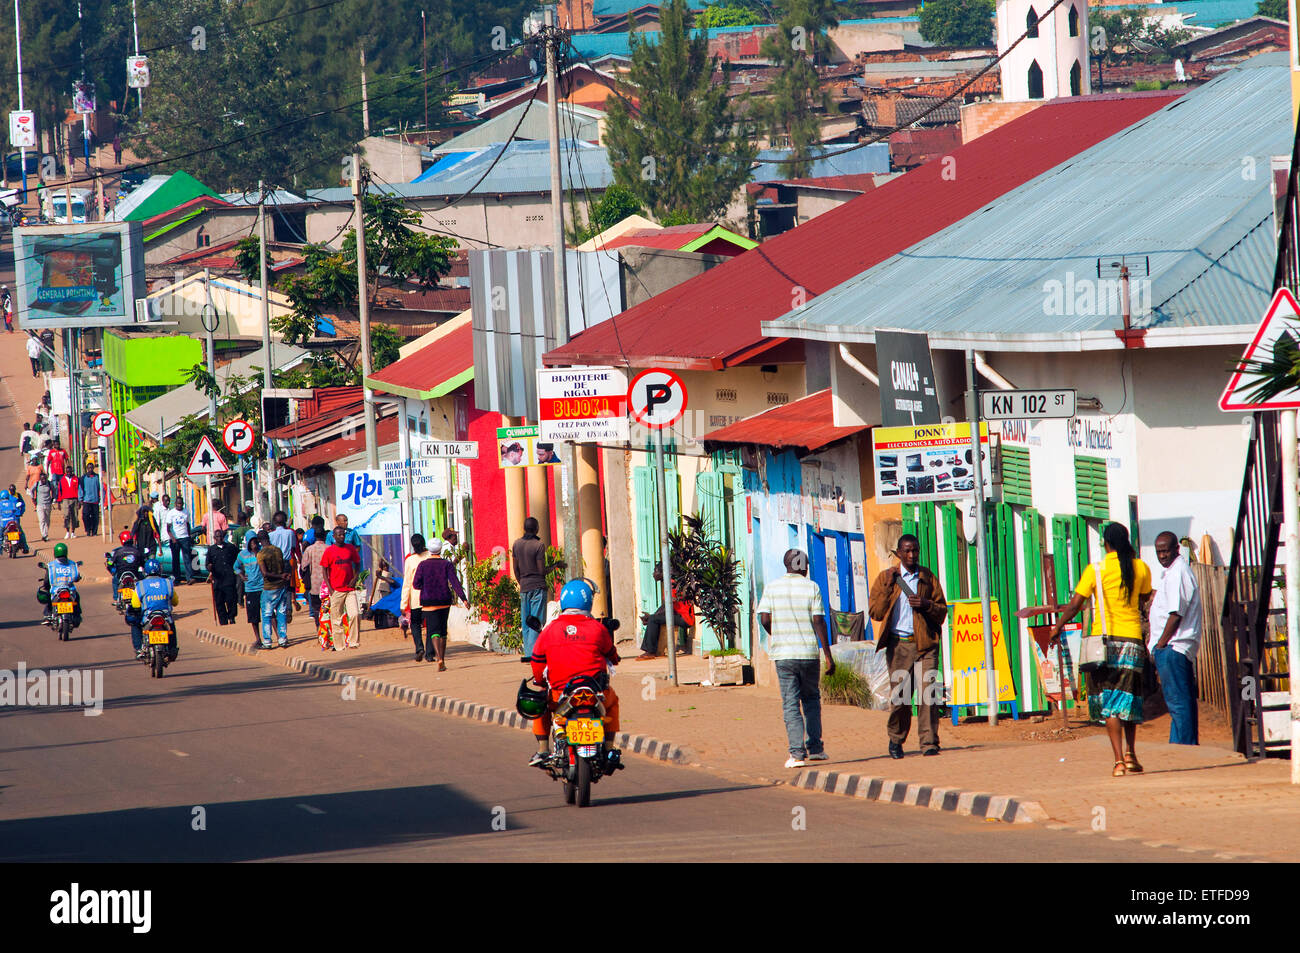 Main street scene - KN 2 Avenue - with brightly painted shops, Nyamirambo, Kigali, Rwanda - Stock Image